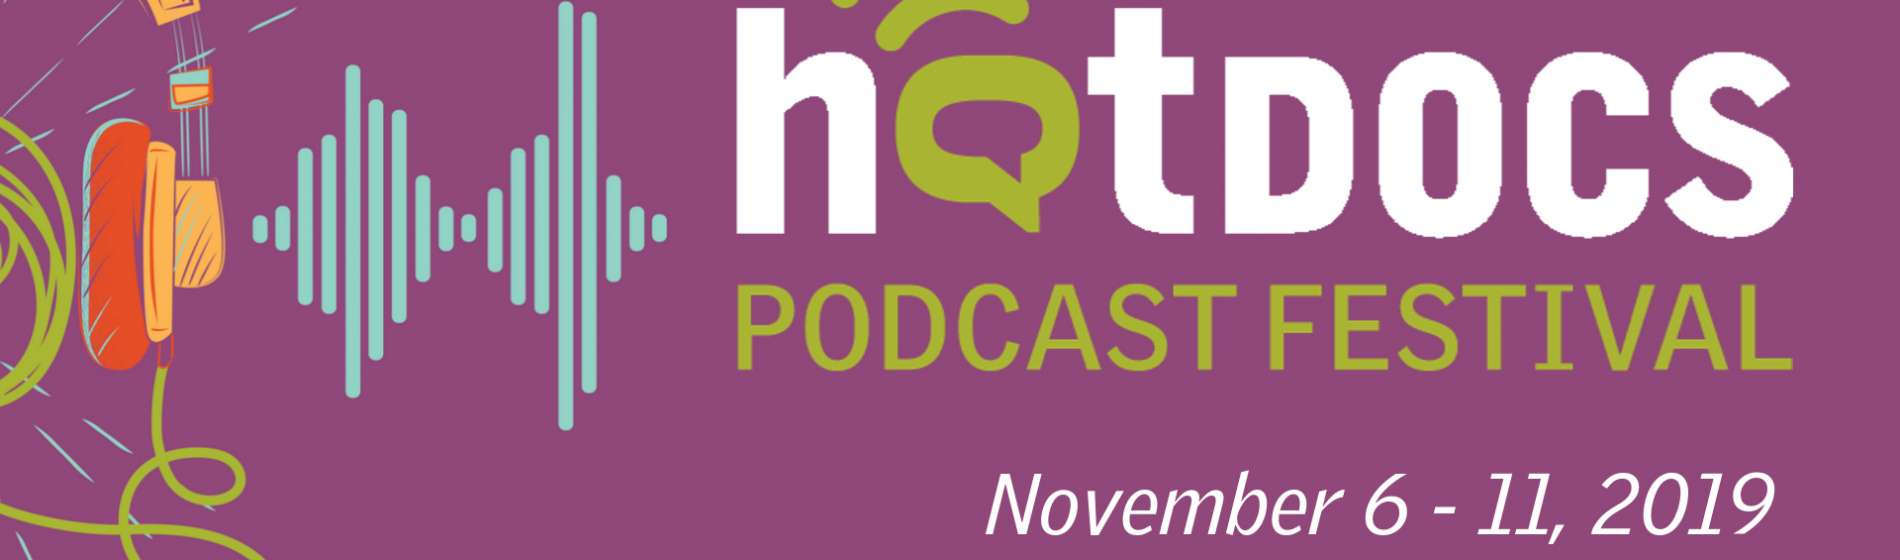 Hot Docs Podcast Festival 2019